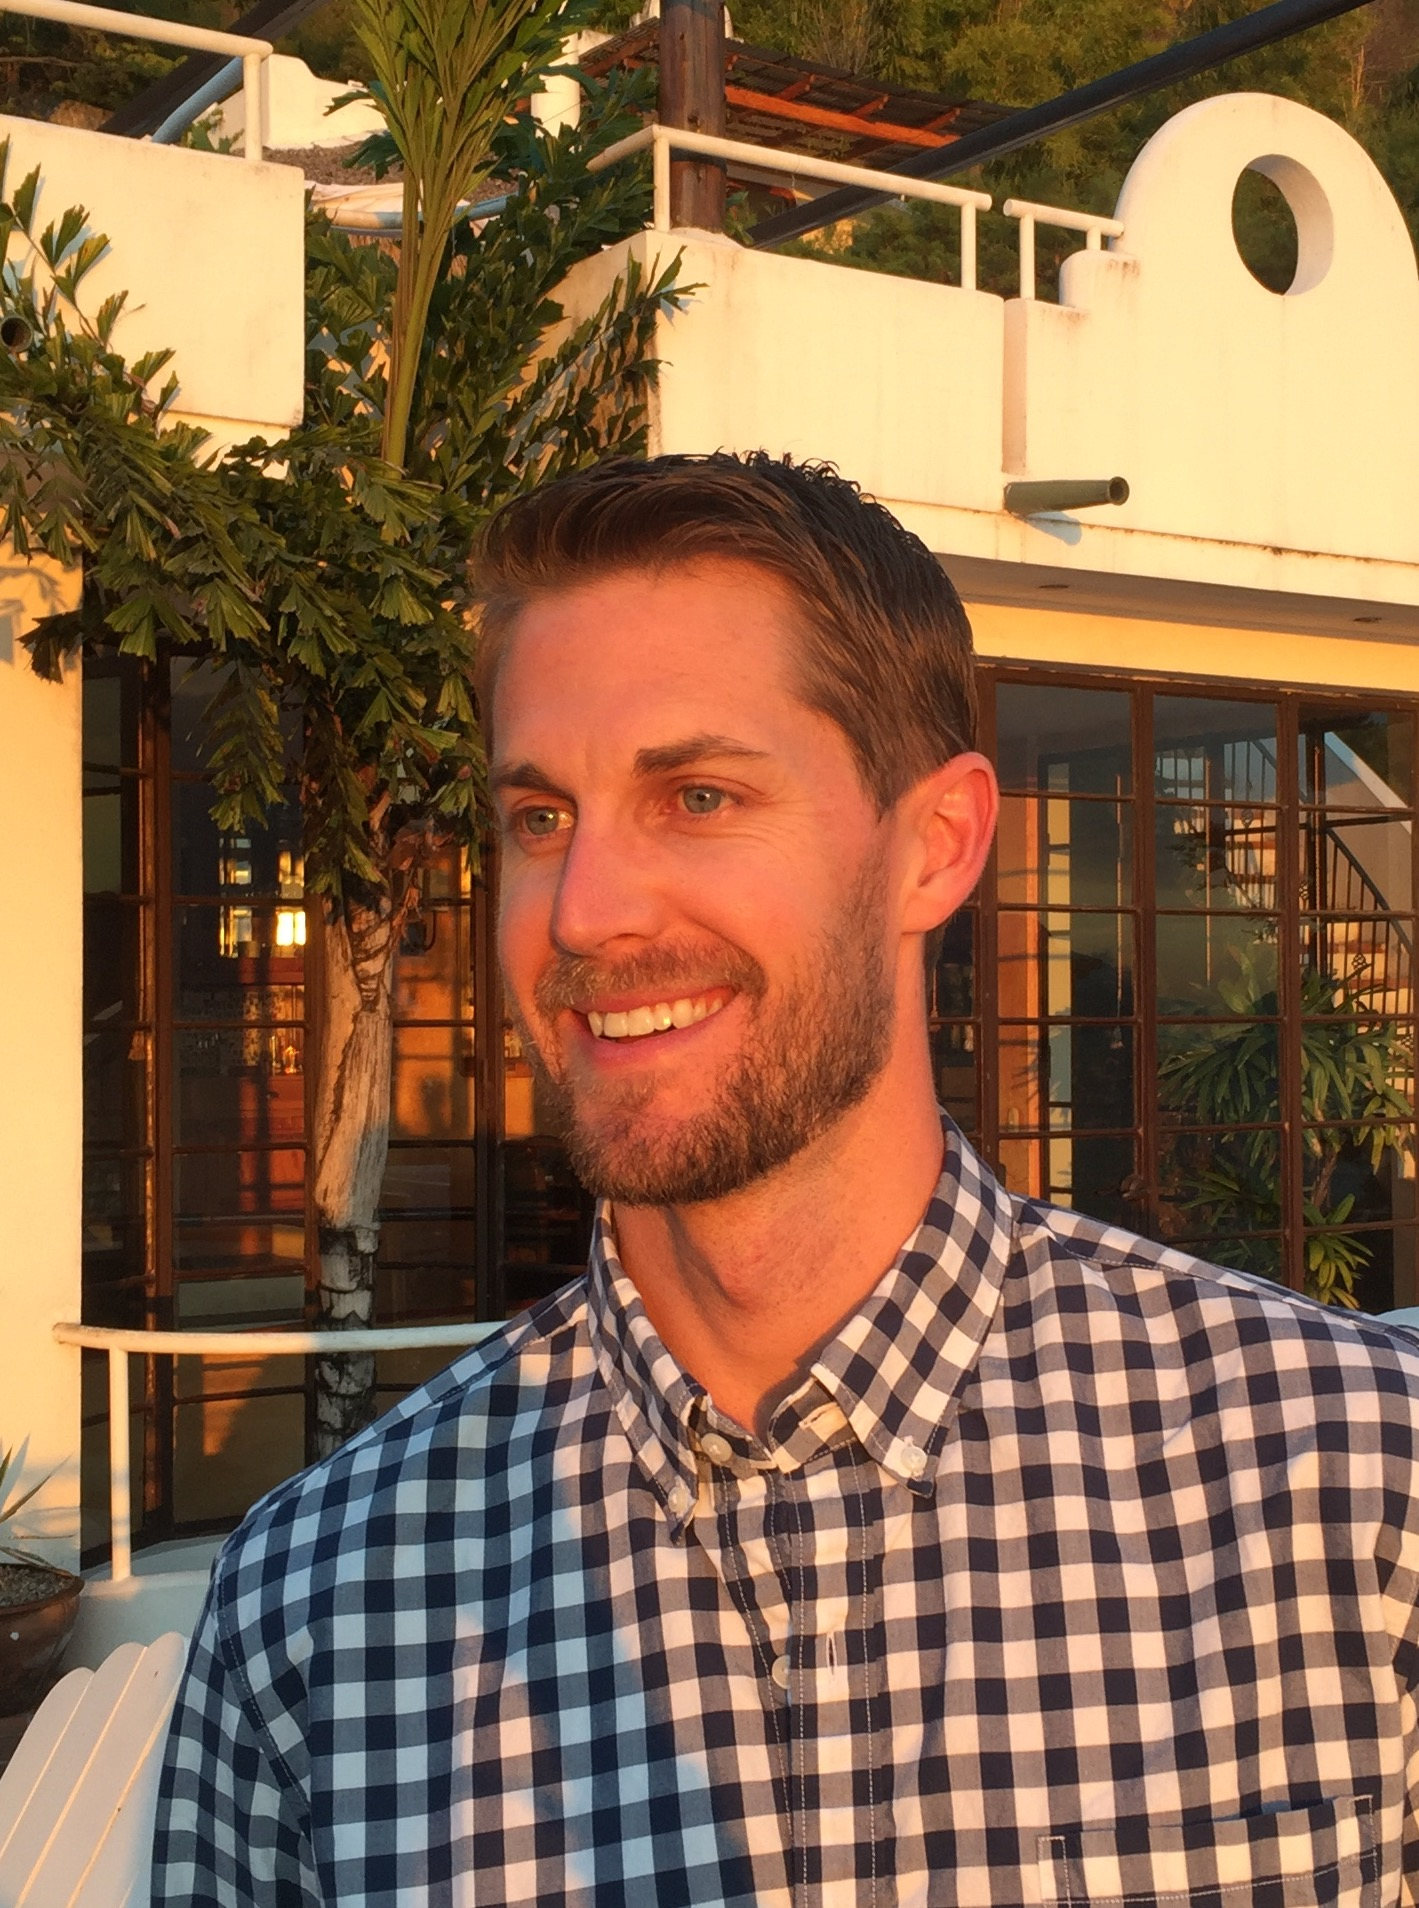 Cofounder of the Orlando Magic Innovation Lab